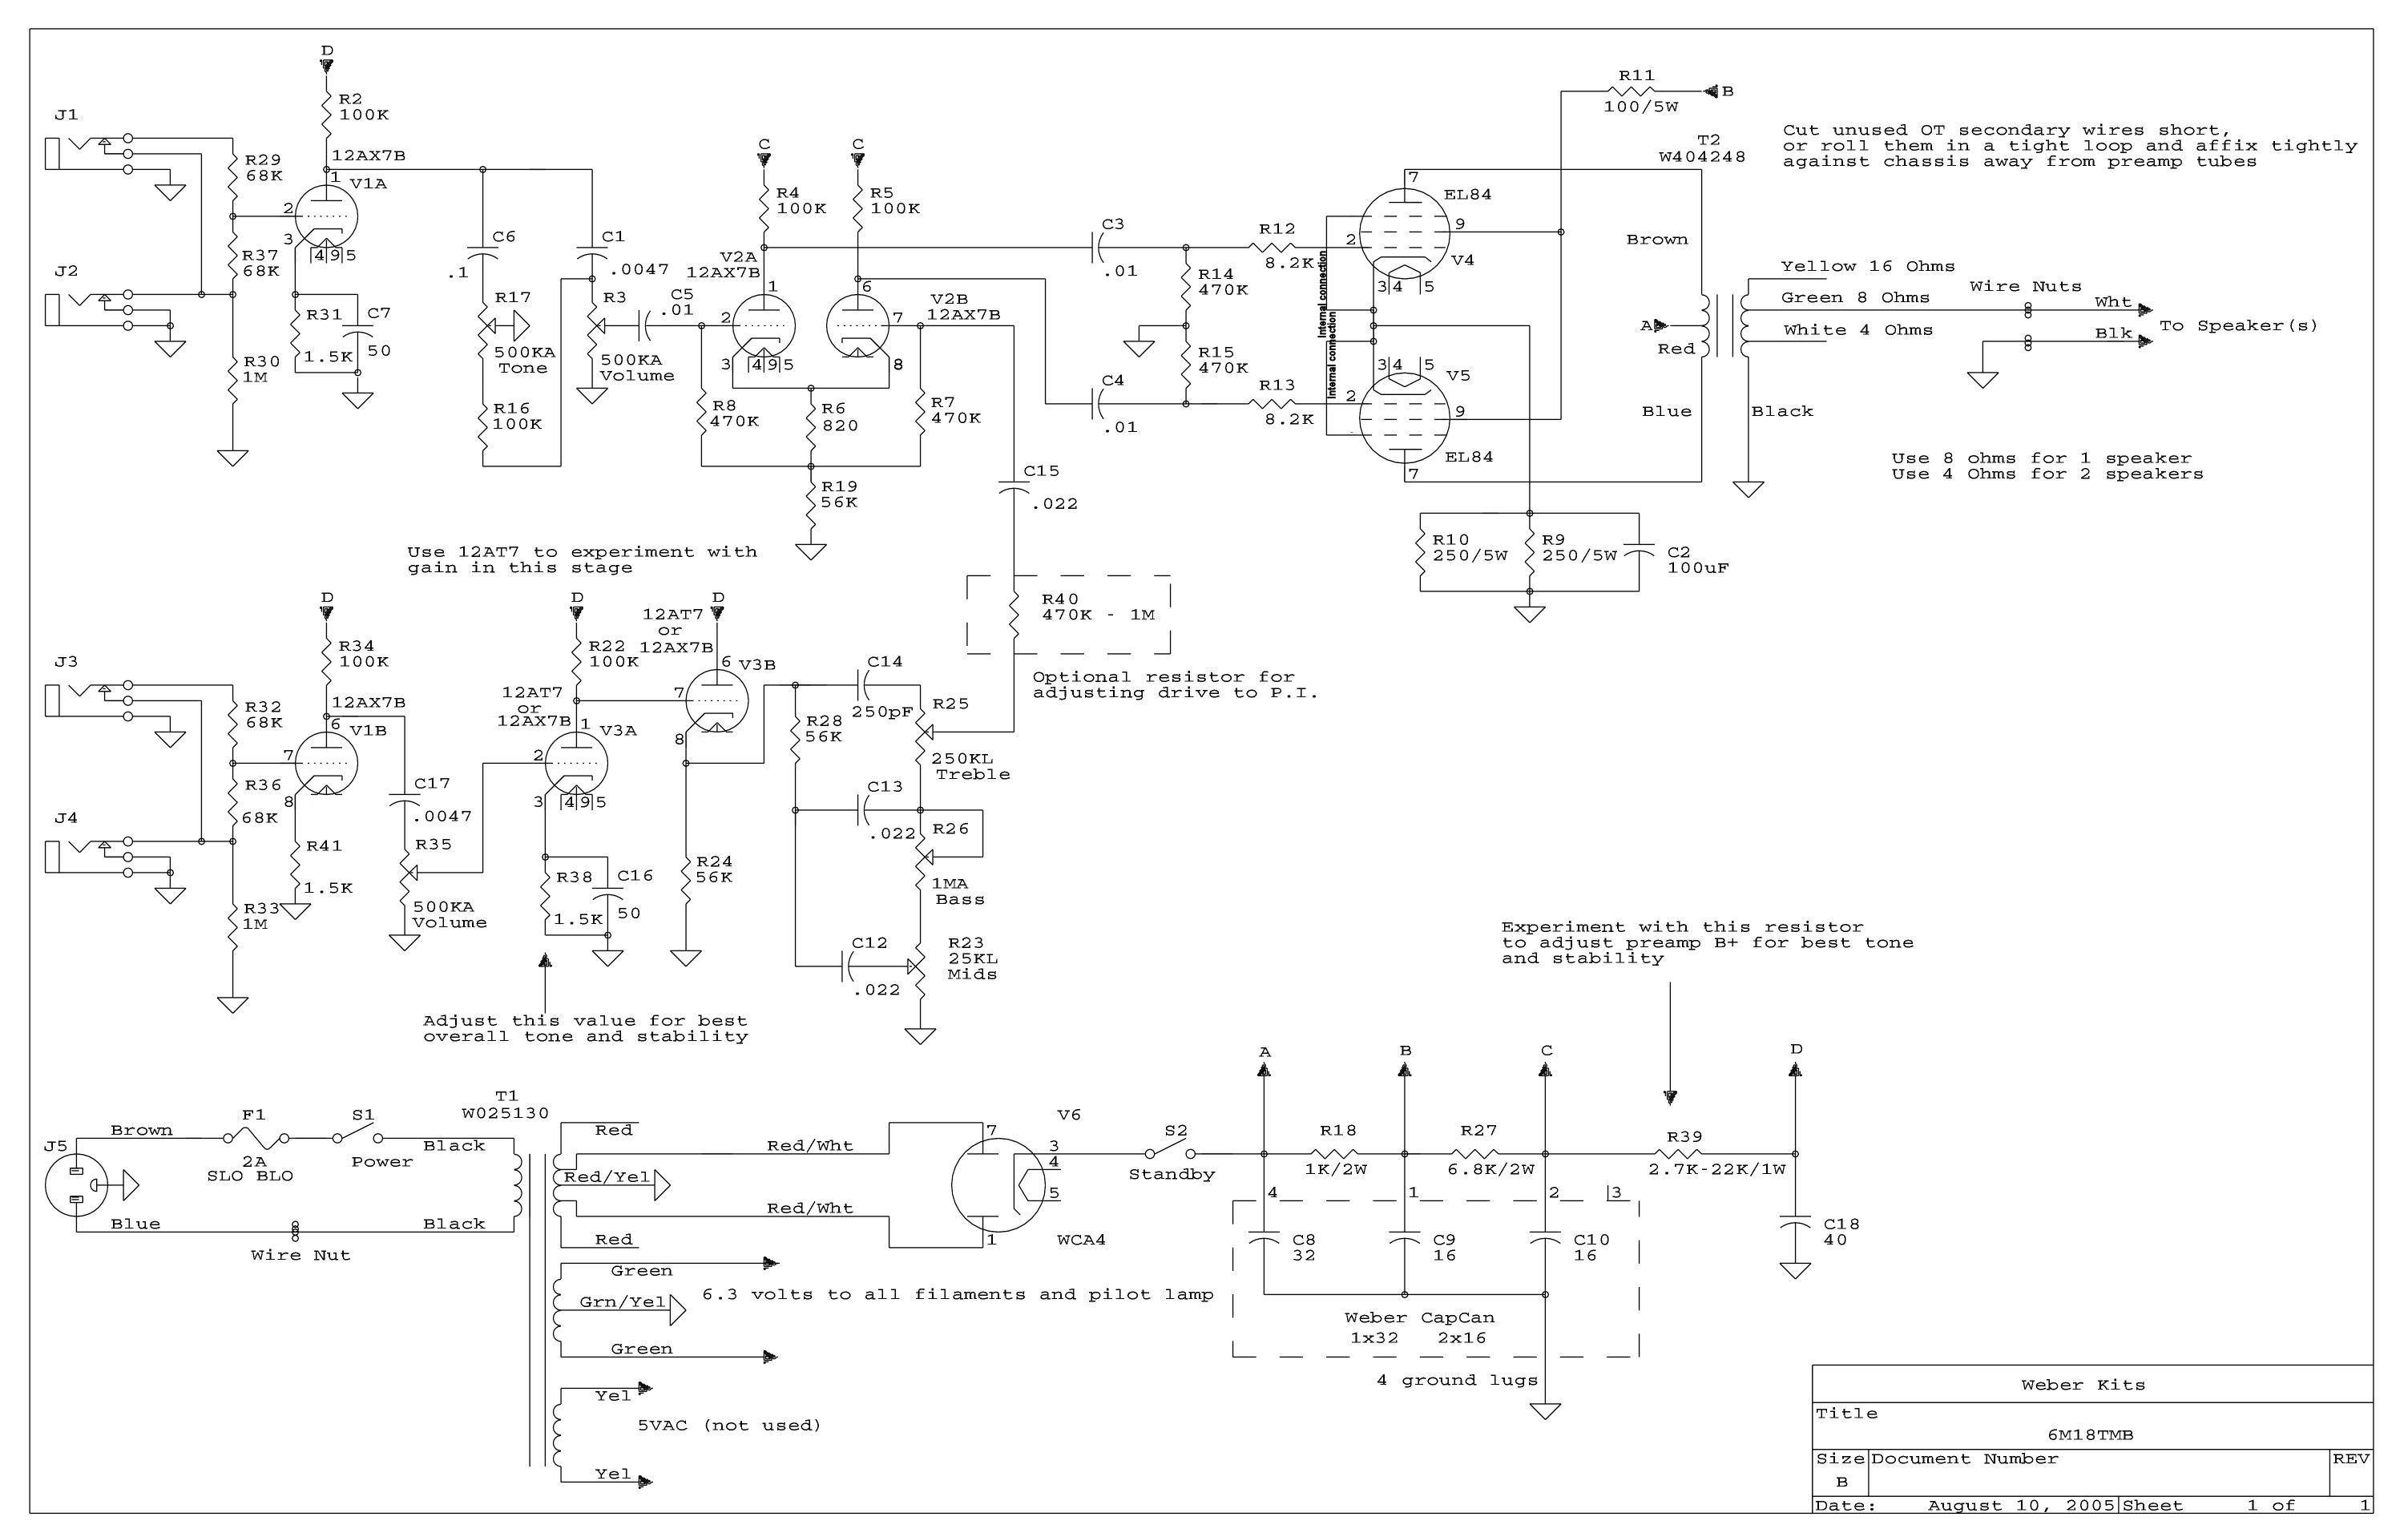 marshall amp schematic 6m18    amp    kit  6m18    amp    kit